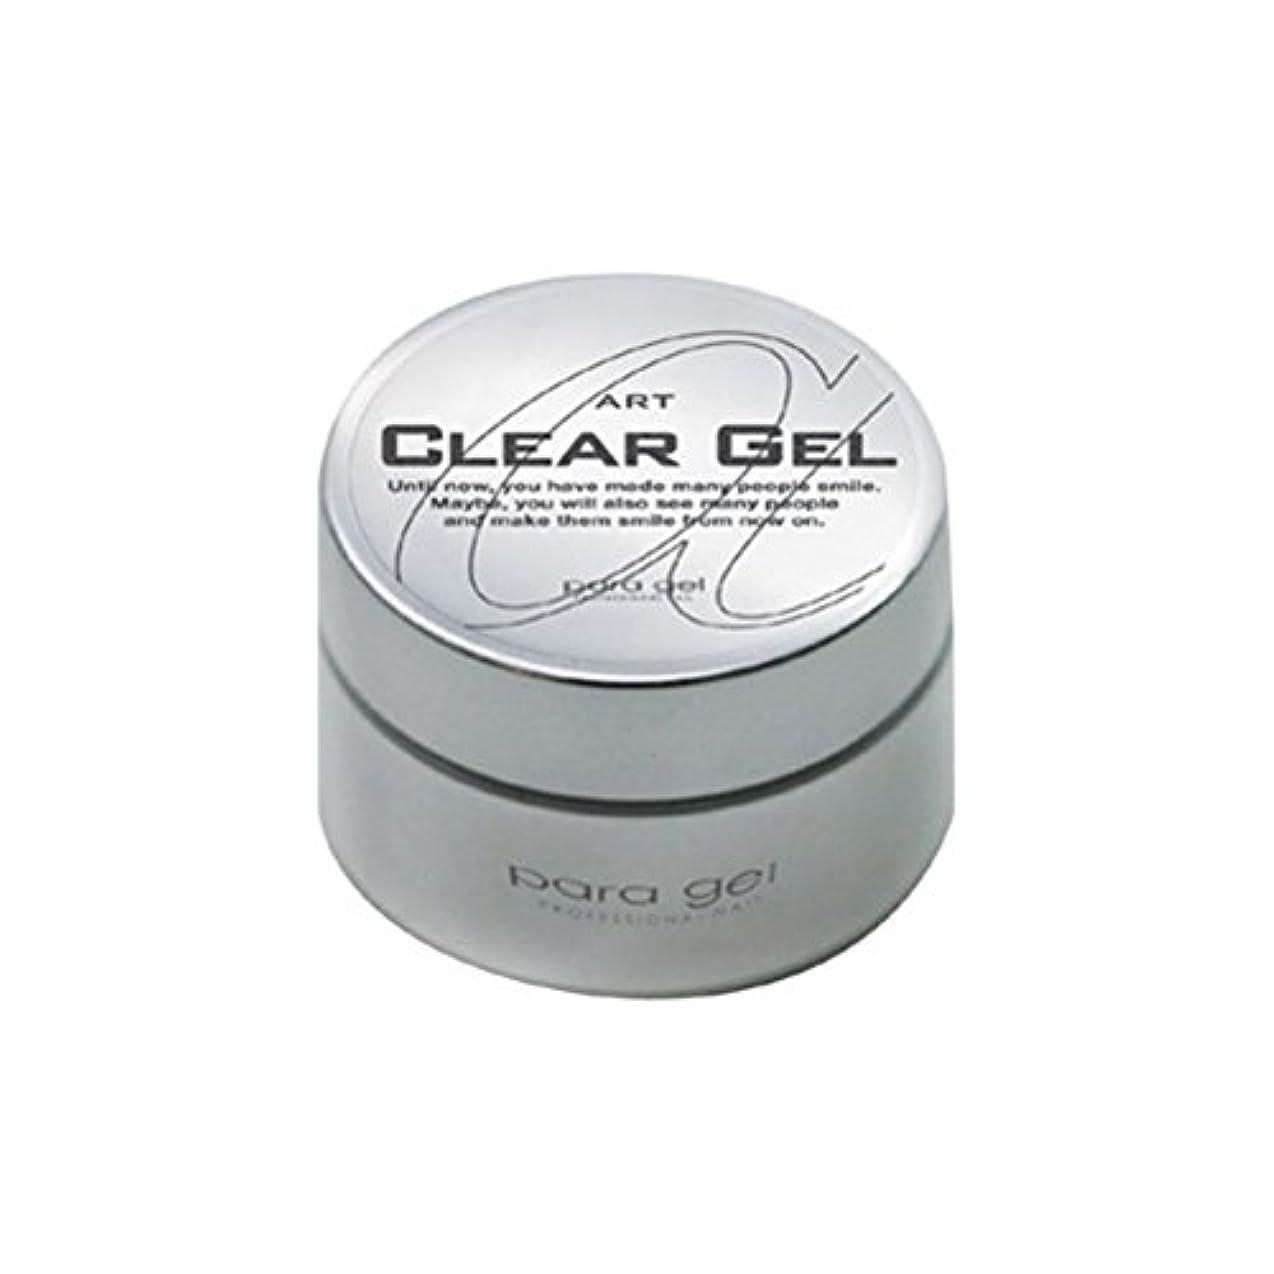 para gel アートクリアジェル 10g サンディング不要のベースジェル